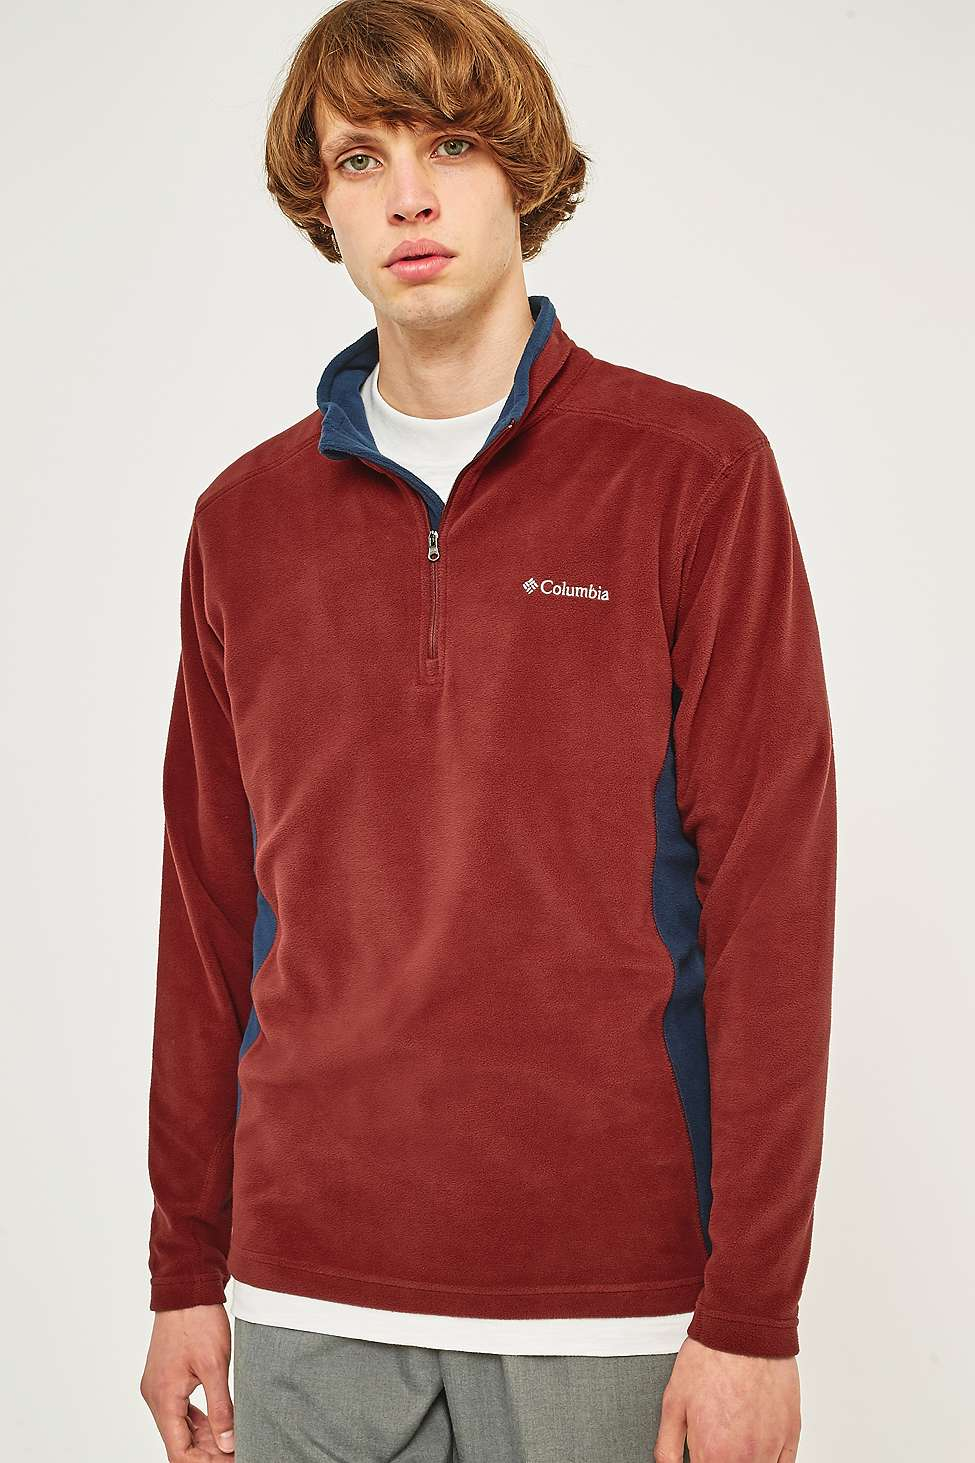 Columbia Klamath Rust Fleece Pullover Jacket | Urban Outfitters